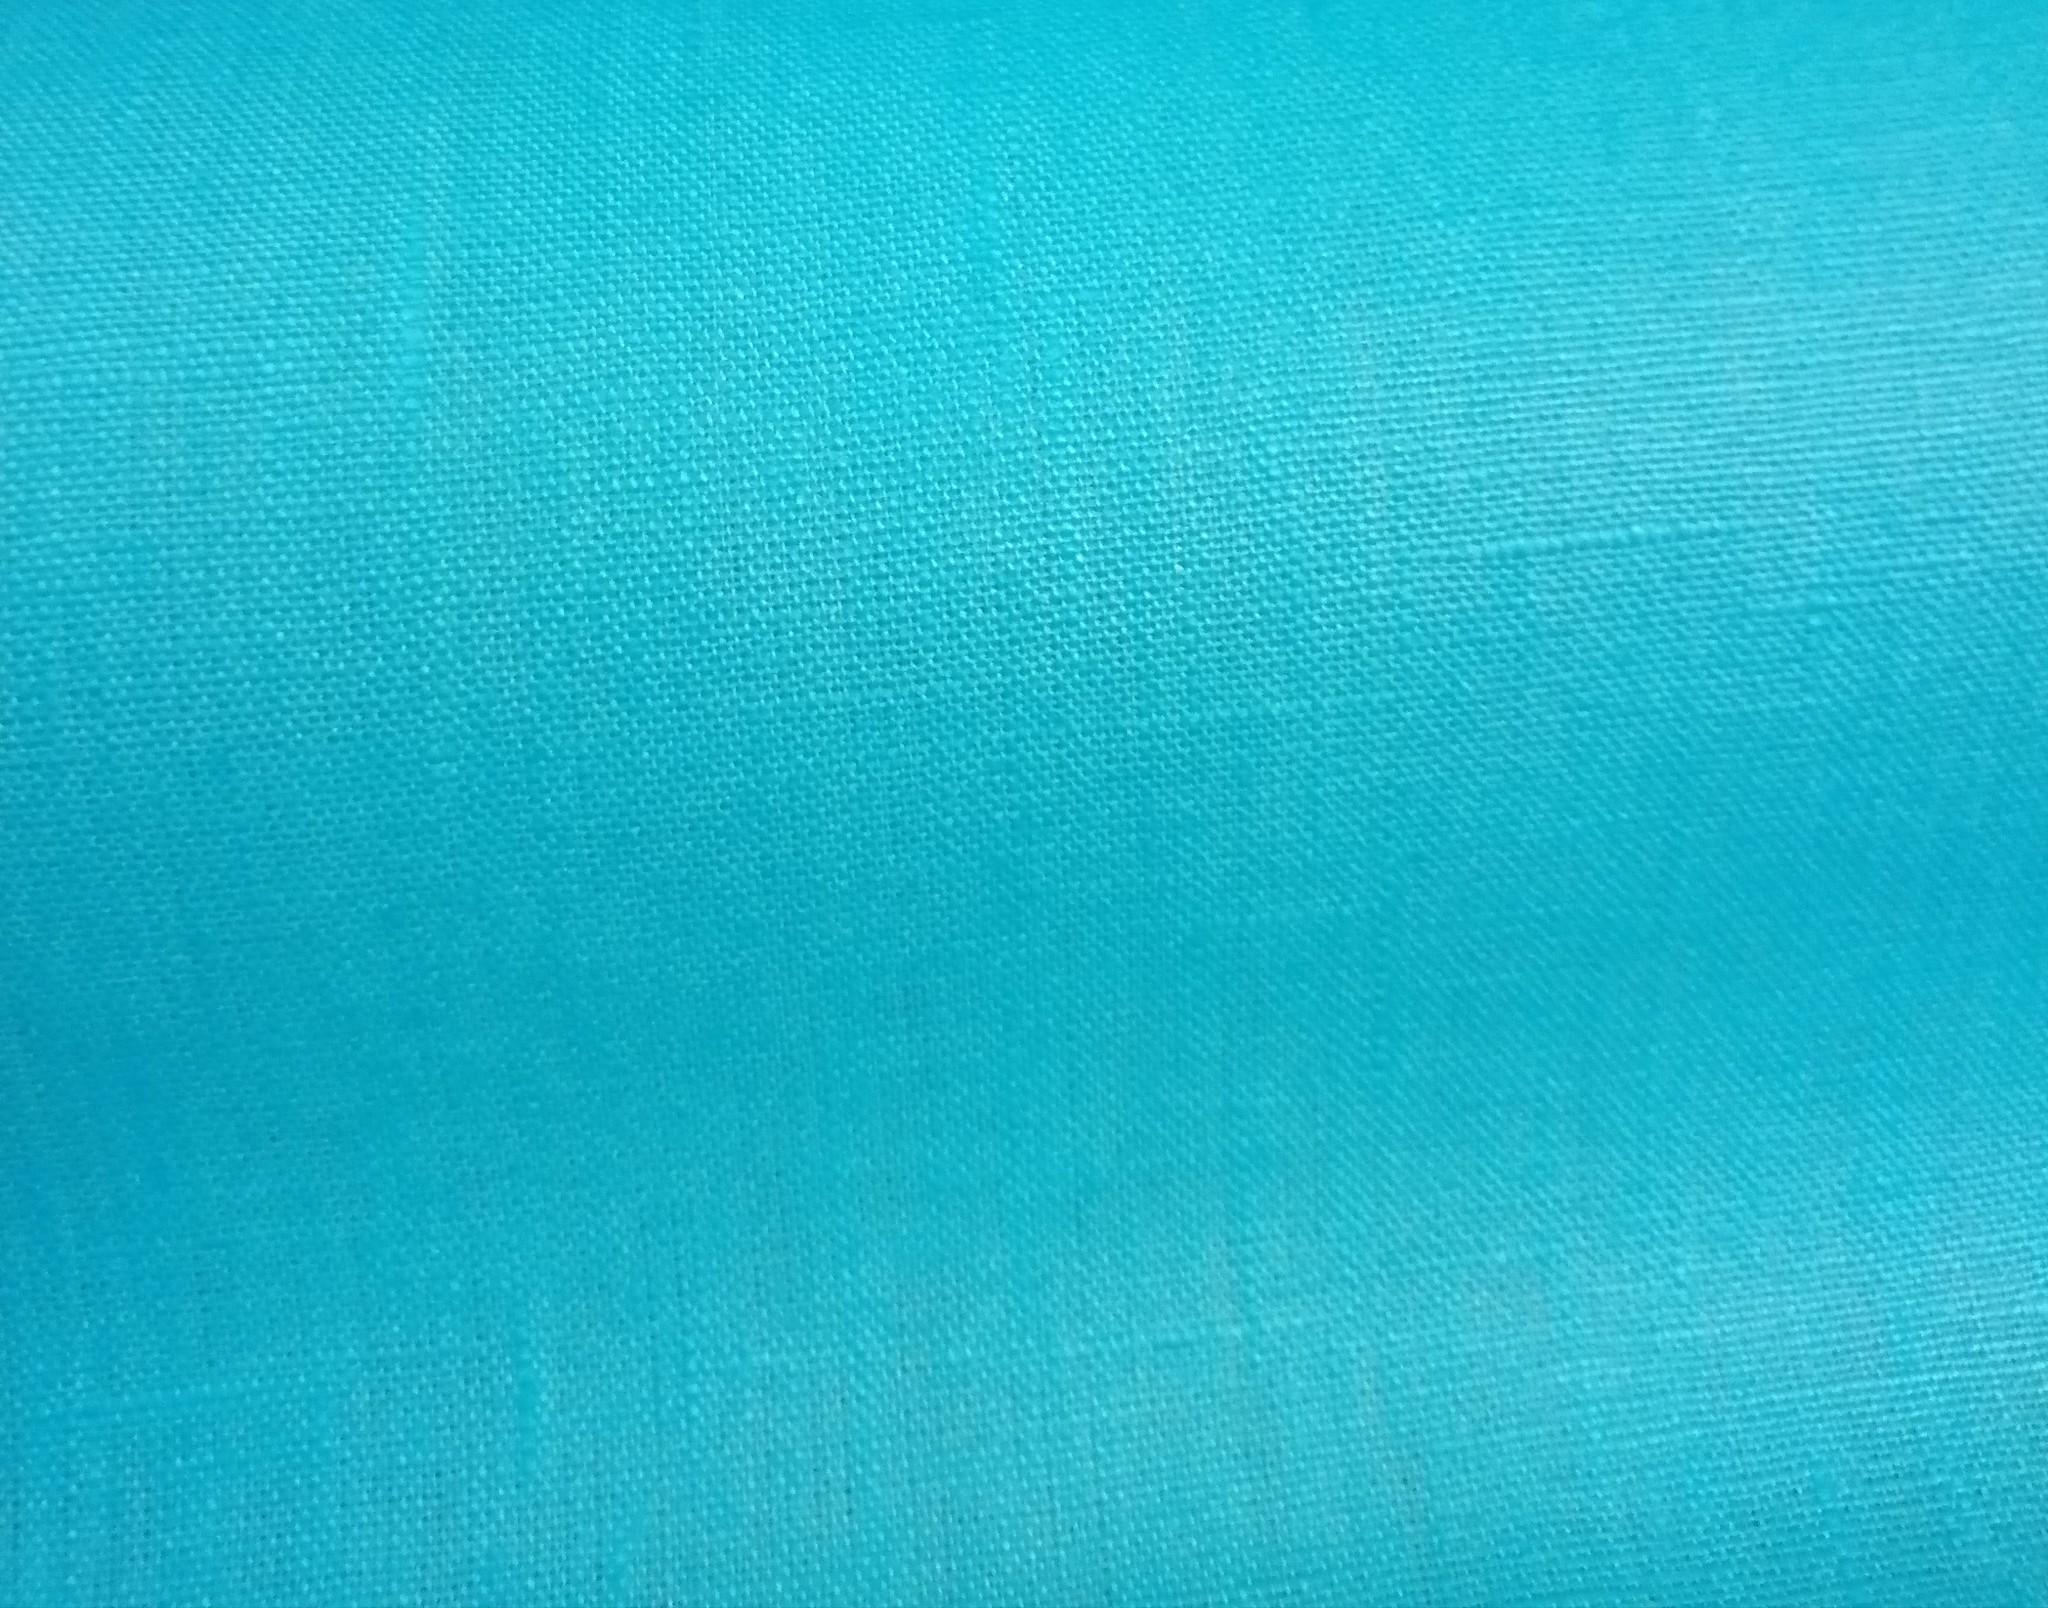 cyaanblauw gecoat linnen